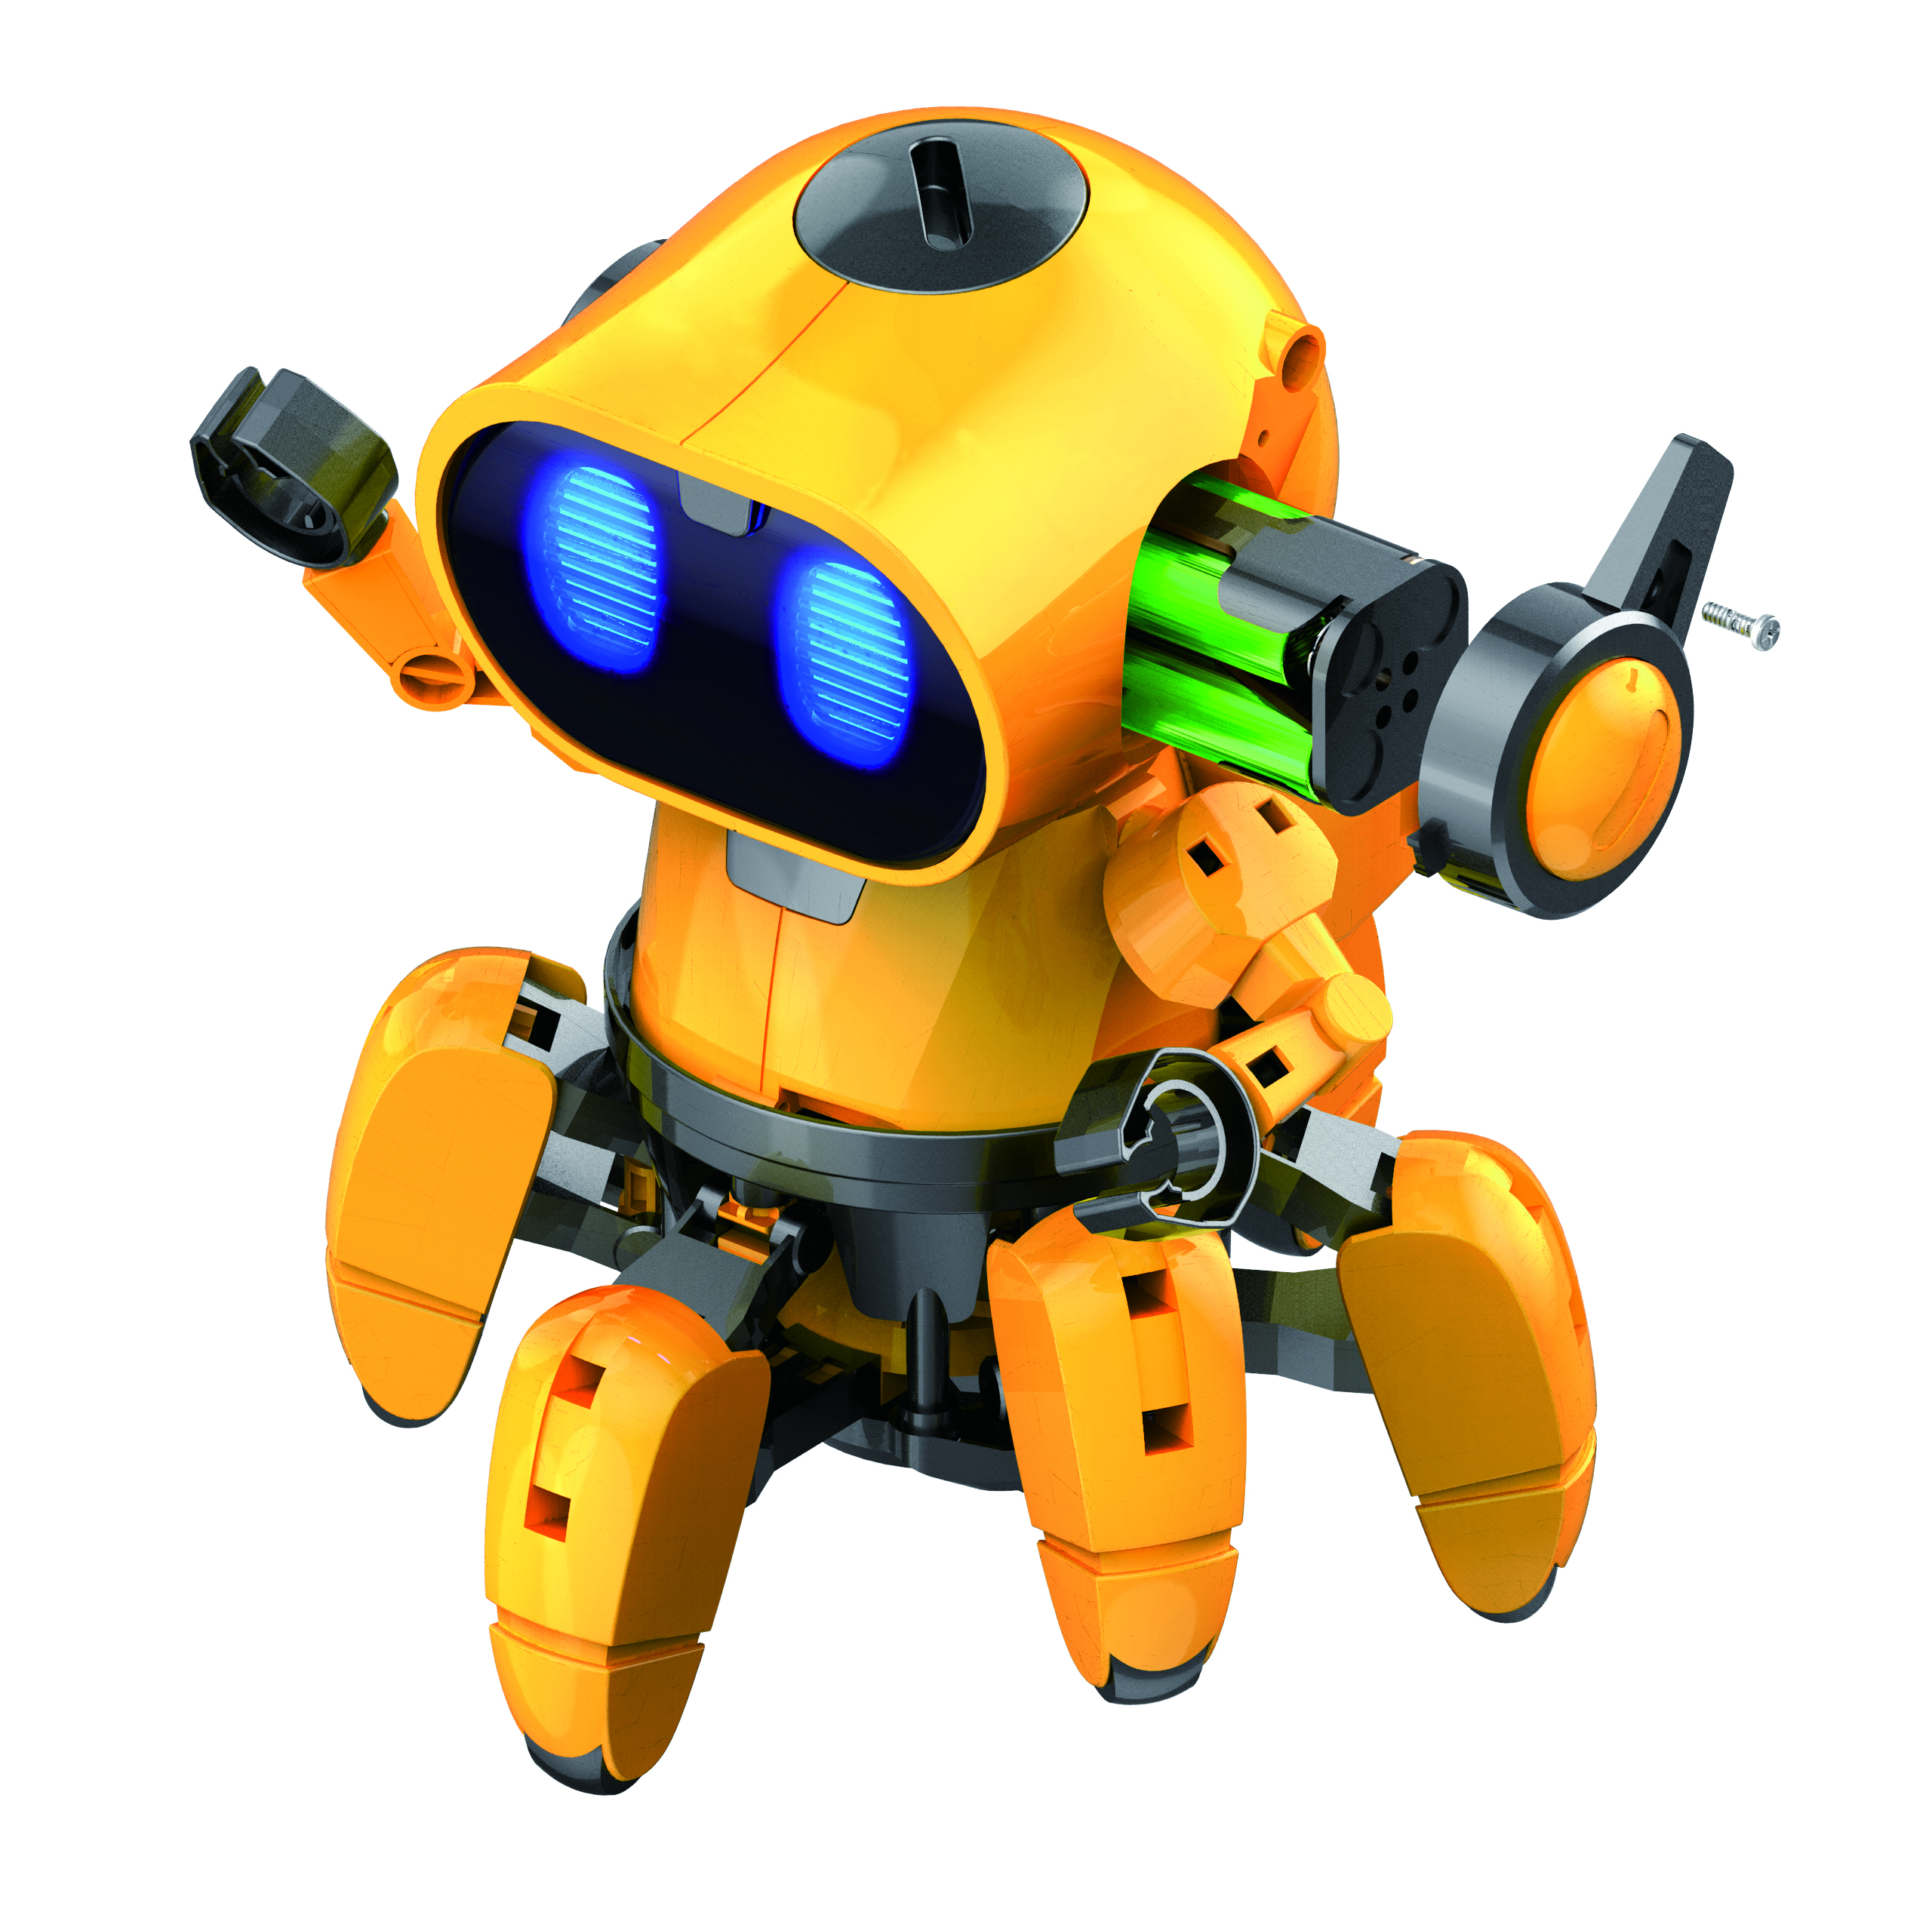 Zivko the Robot - TEACH TECH- Elenco Electronics